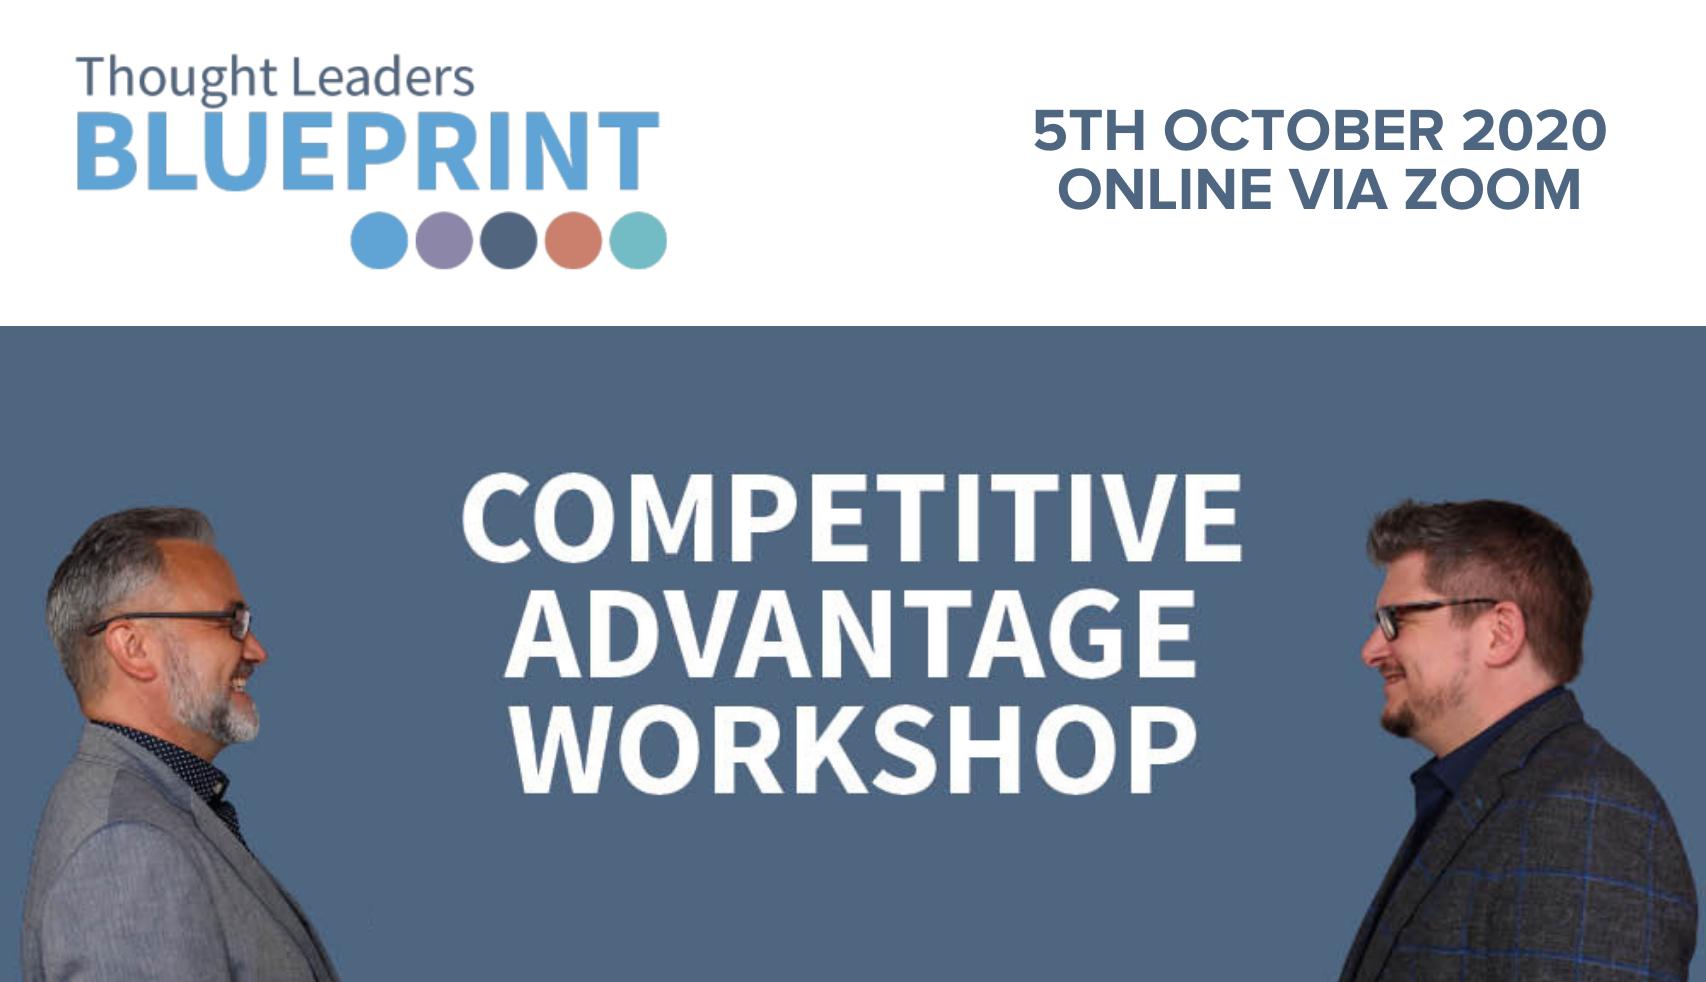 Thought Leadership Blueprint - Competitive Advantage Workshop